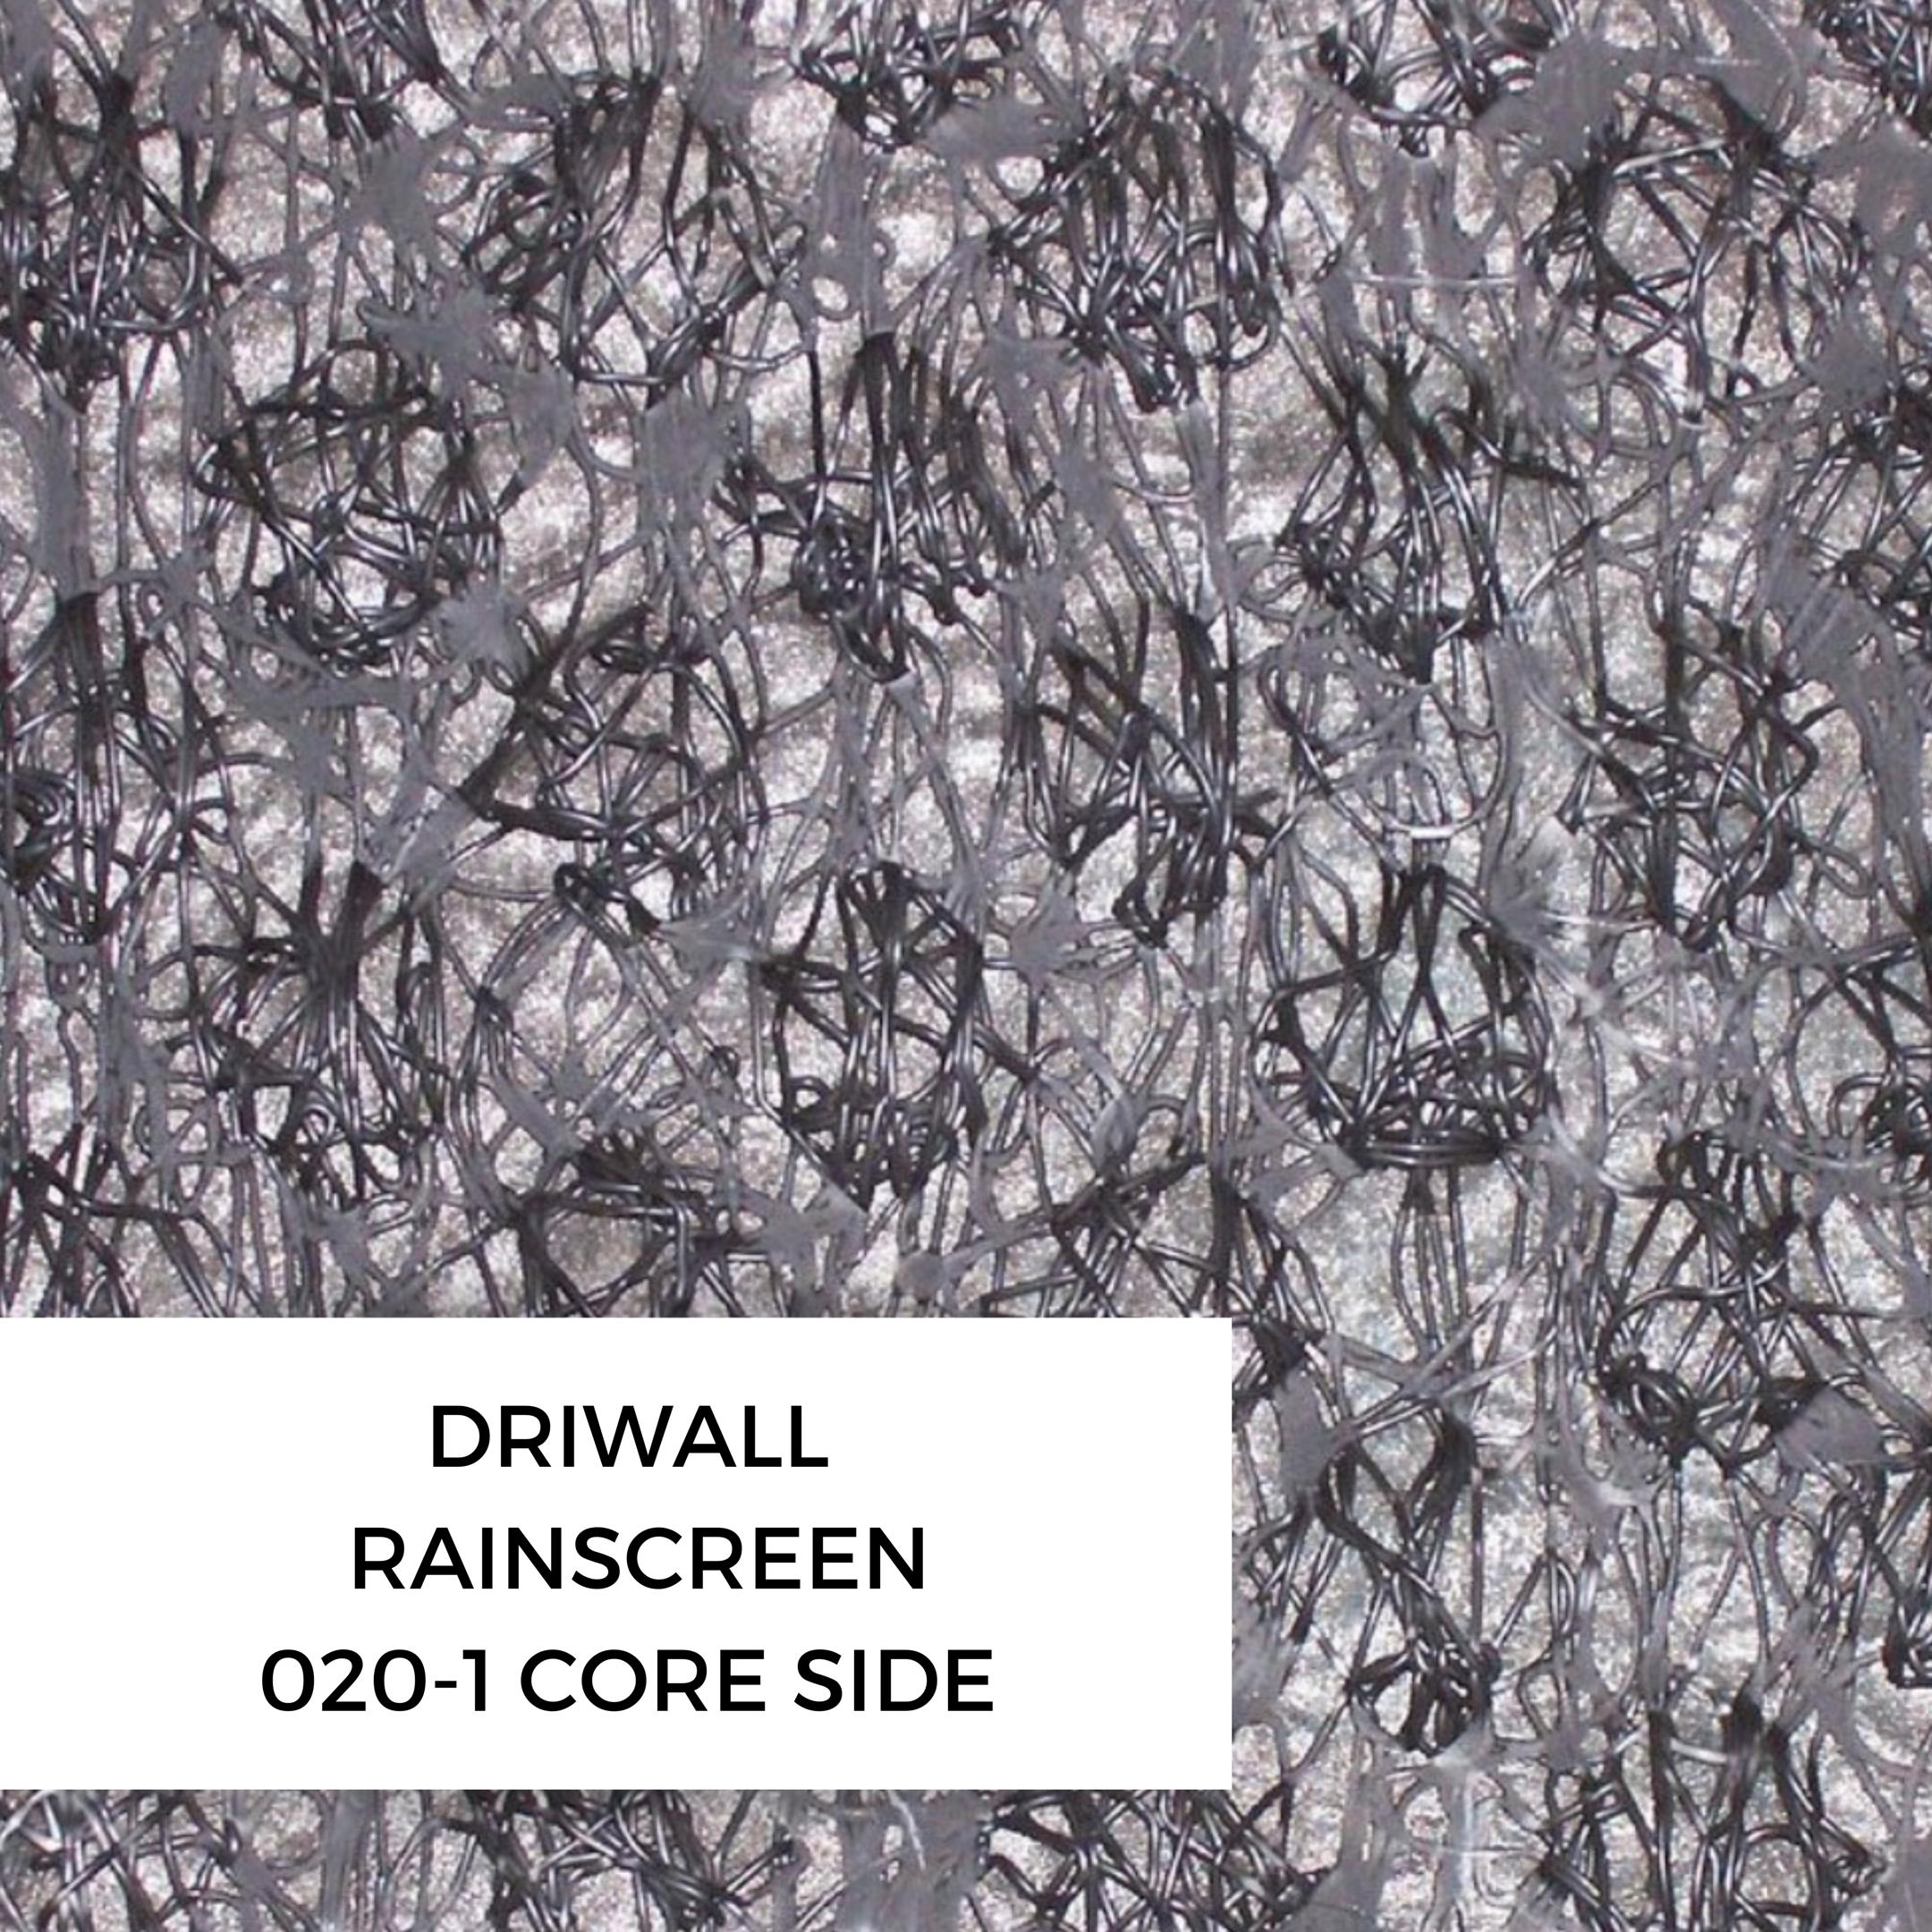 Copy of DRIWALL RAINSCREEN ROLL.PNG